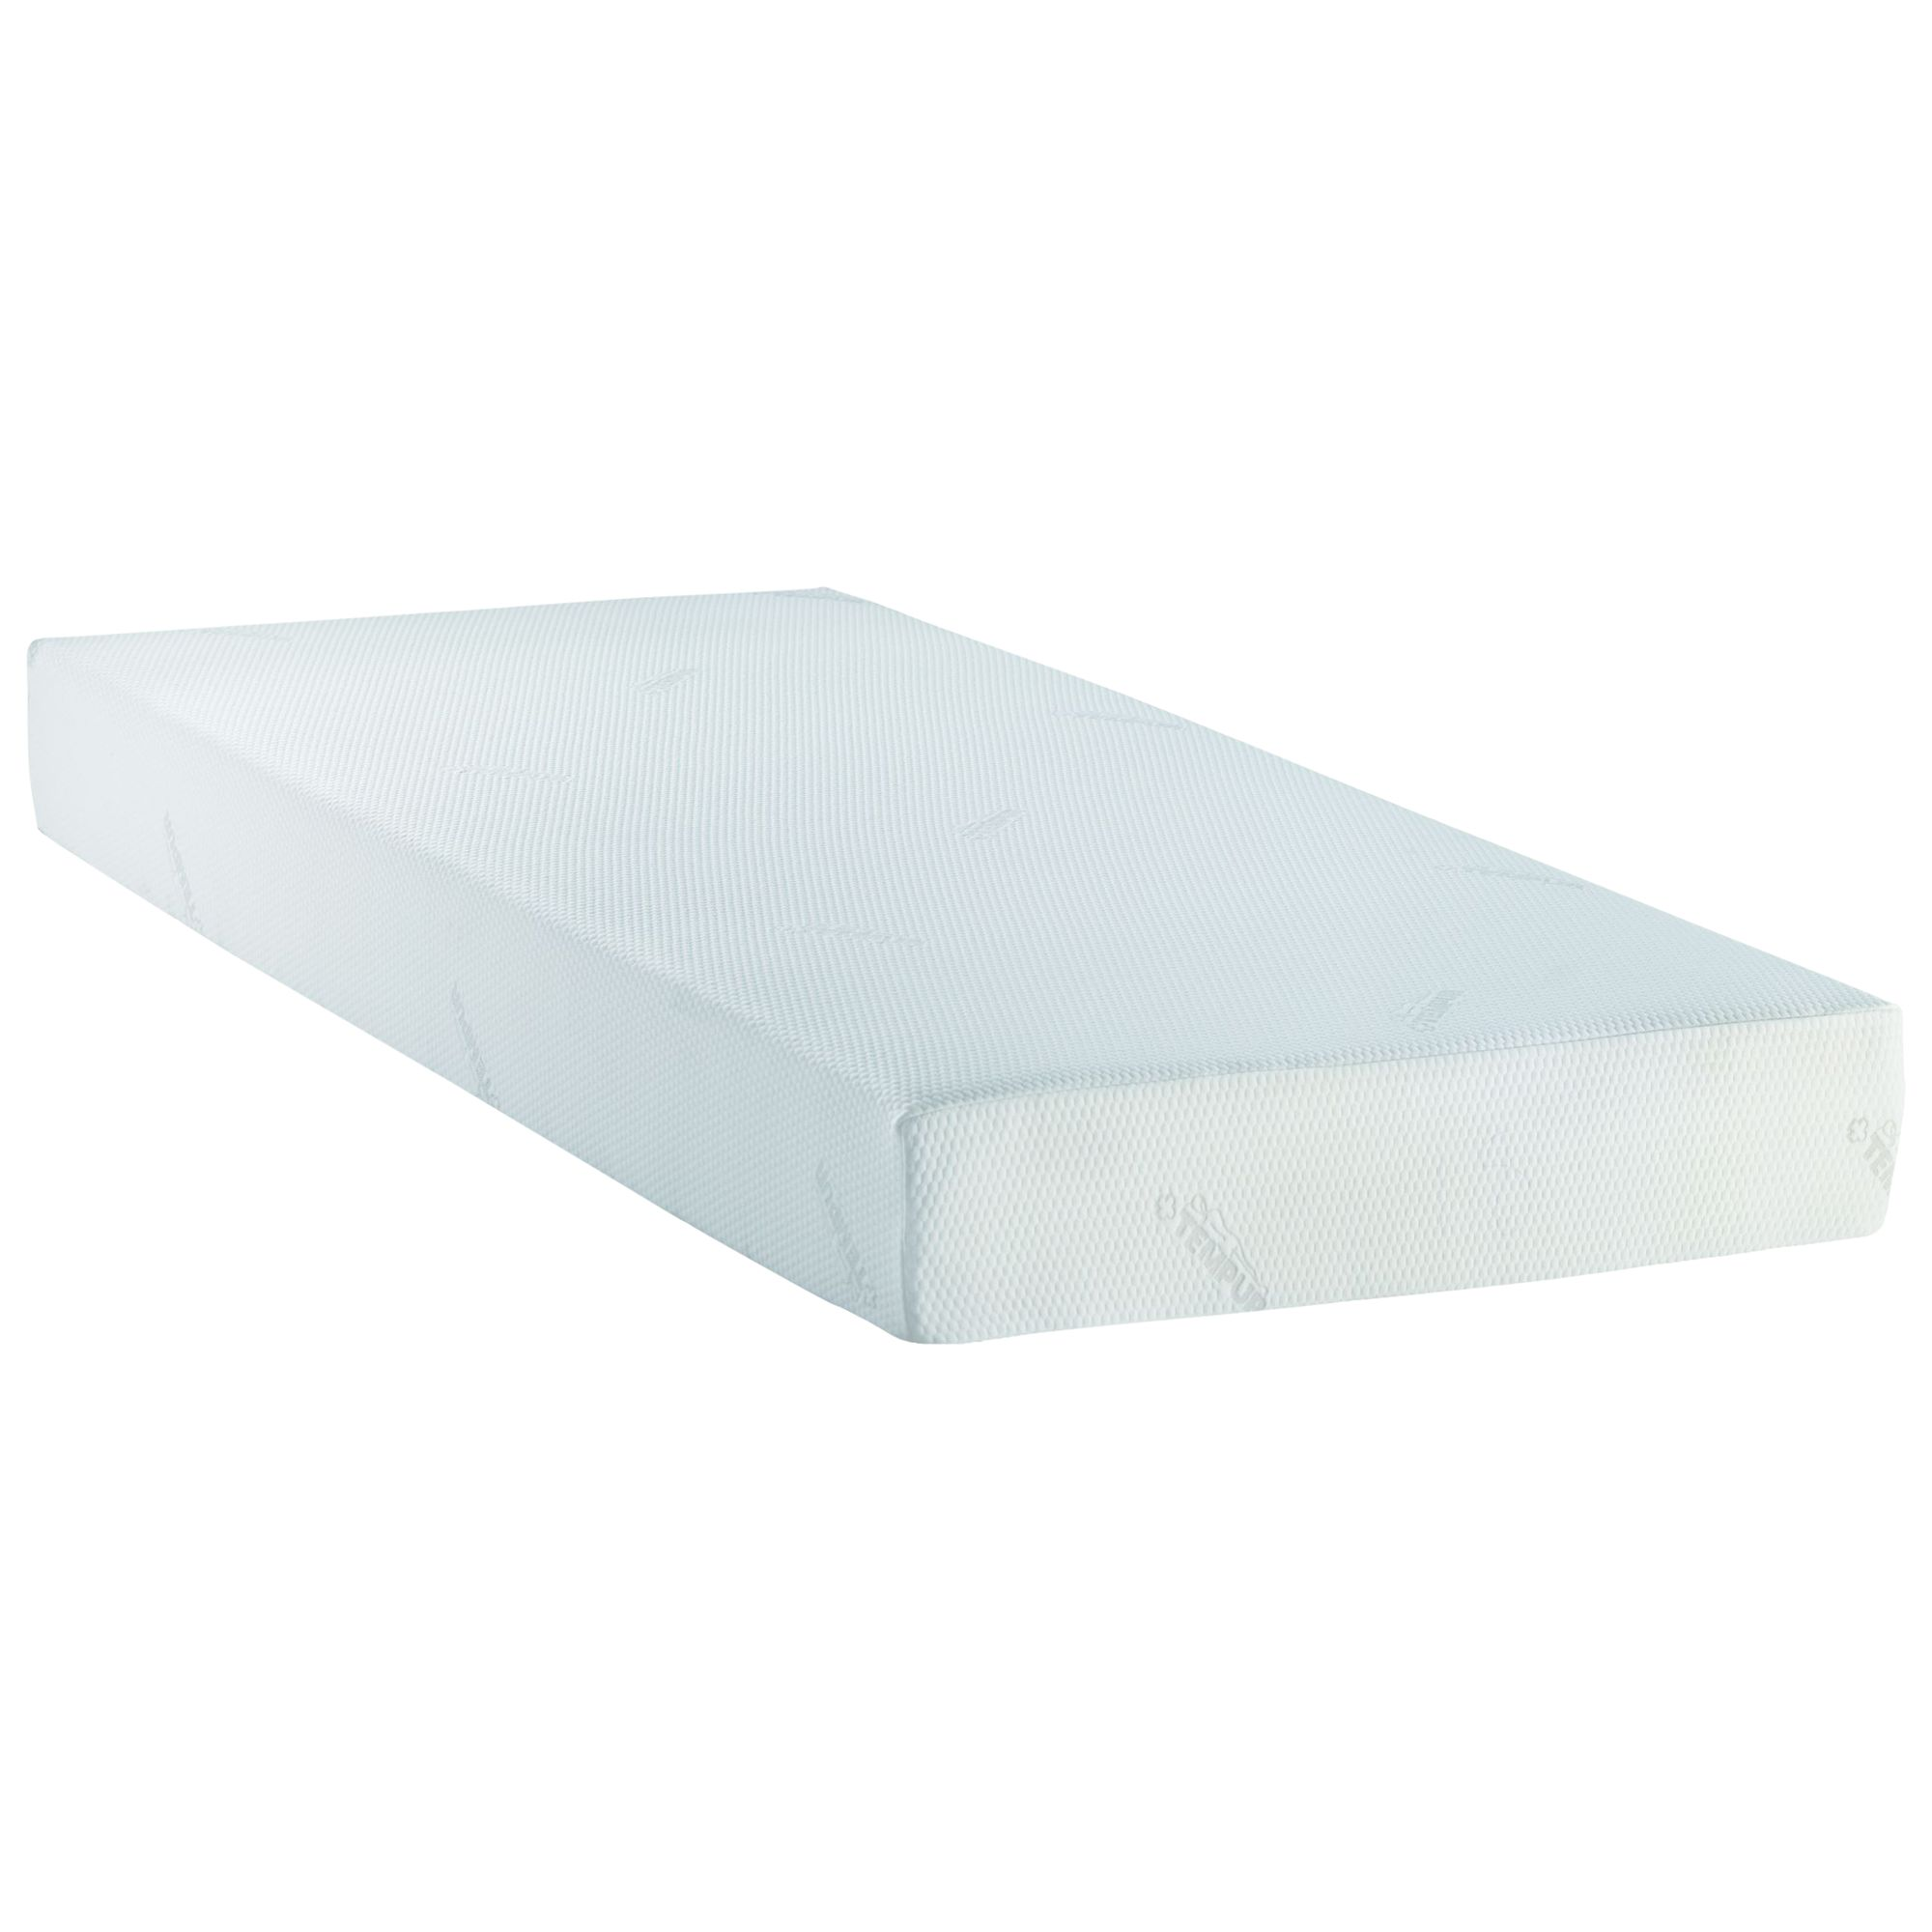 tempur cloud deluxe 22 mattress medium bed mattress sale. Black Bedroom Furniture Sets. Home Design Ideas